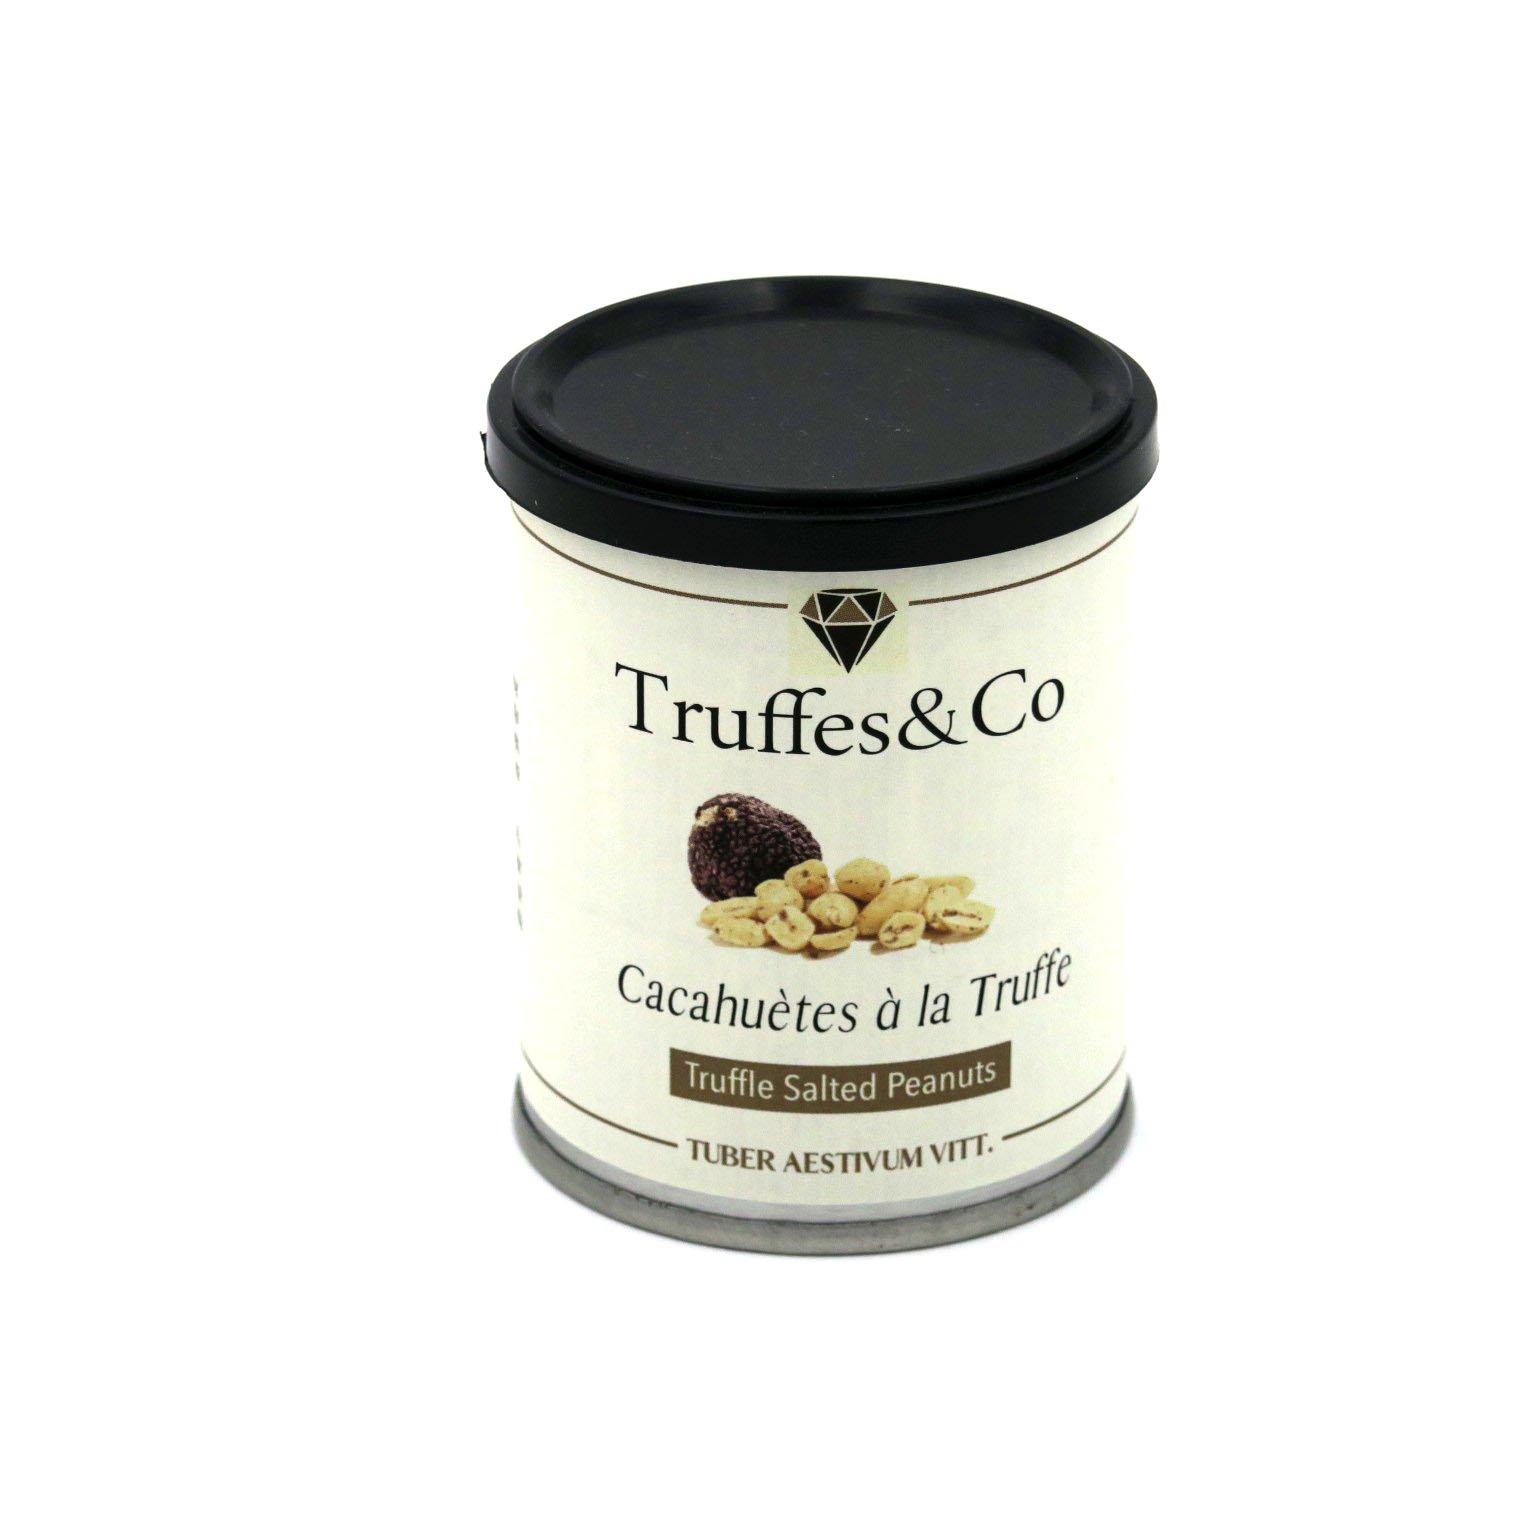 TC-CACTE60 Cacahuètes à la Truffe